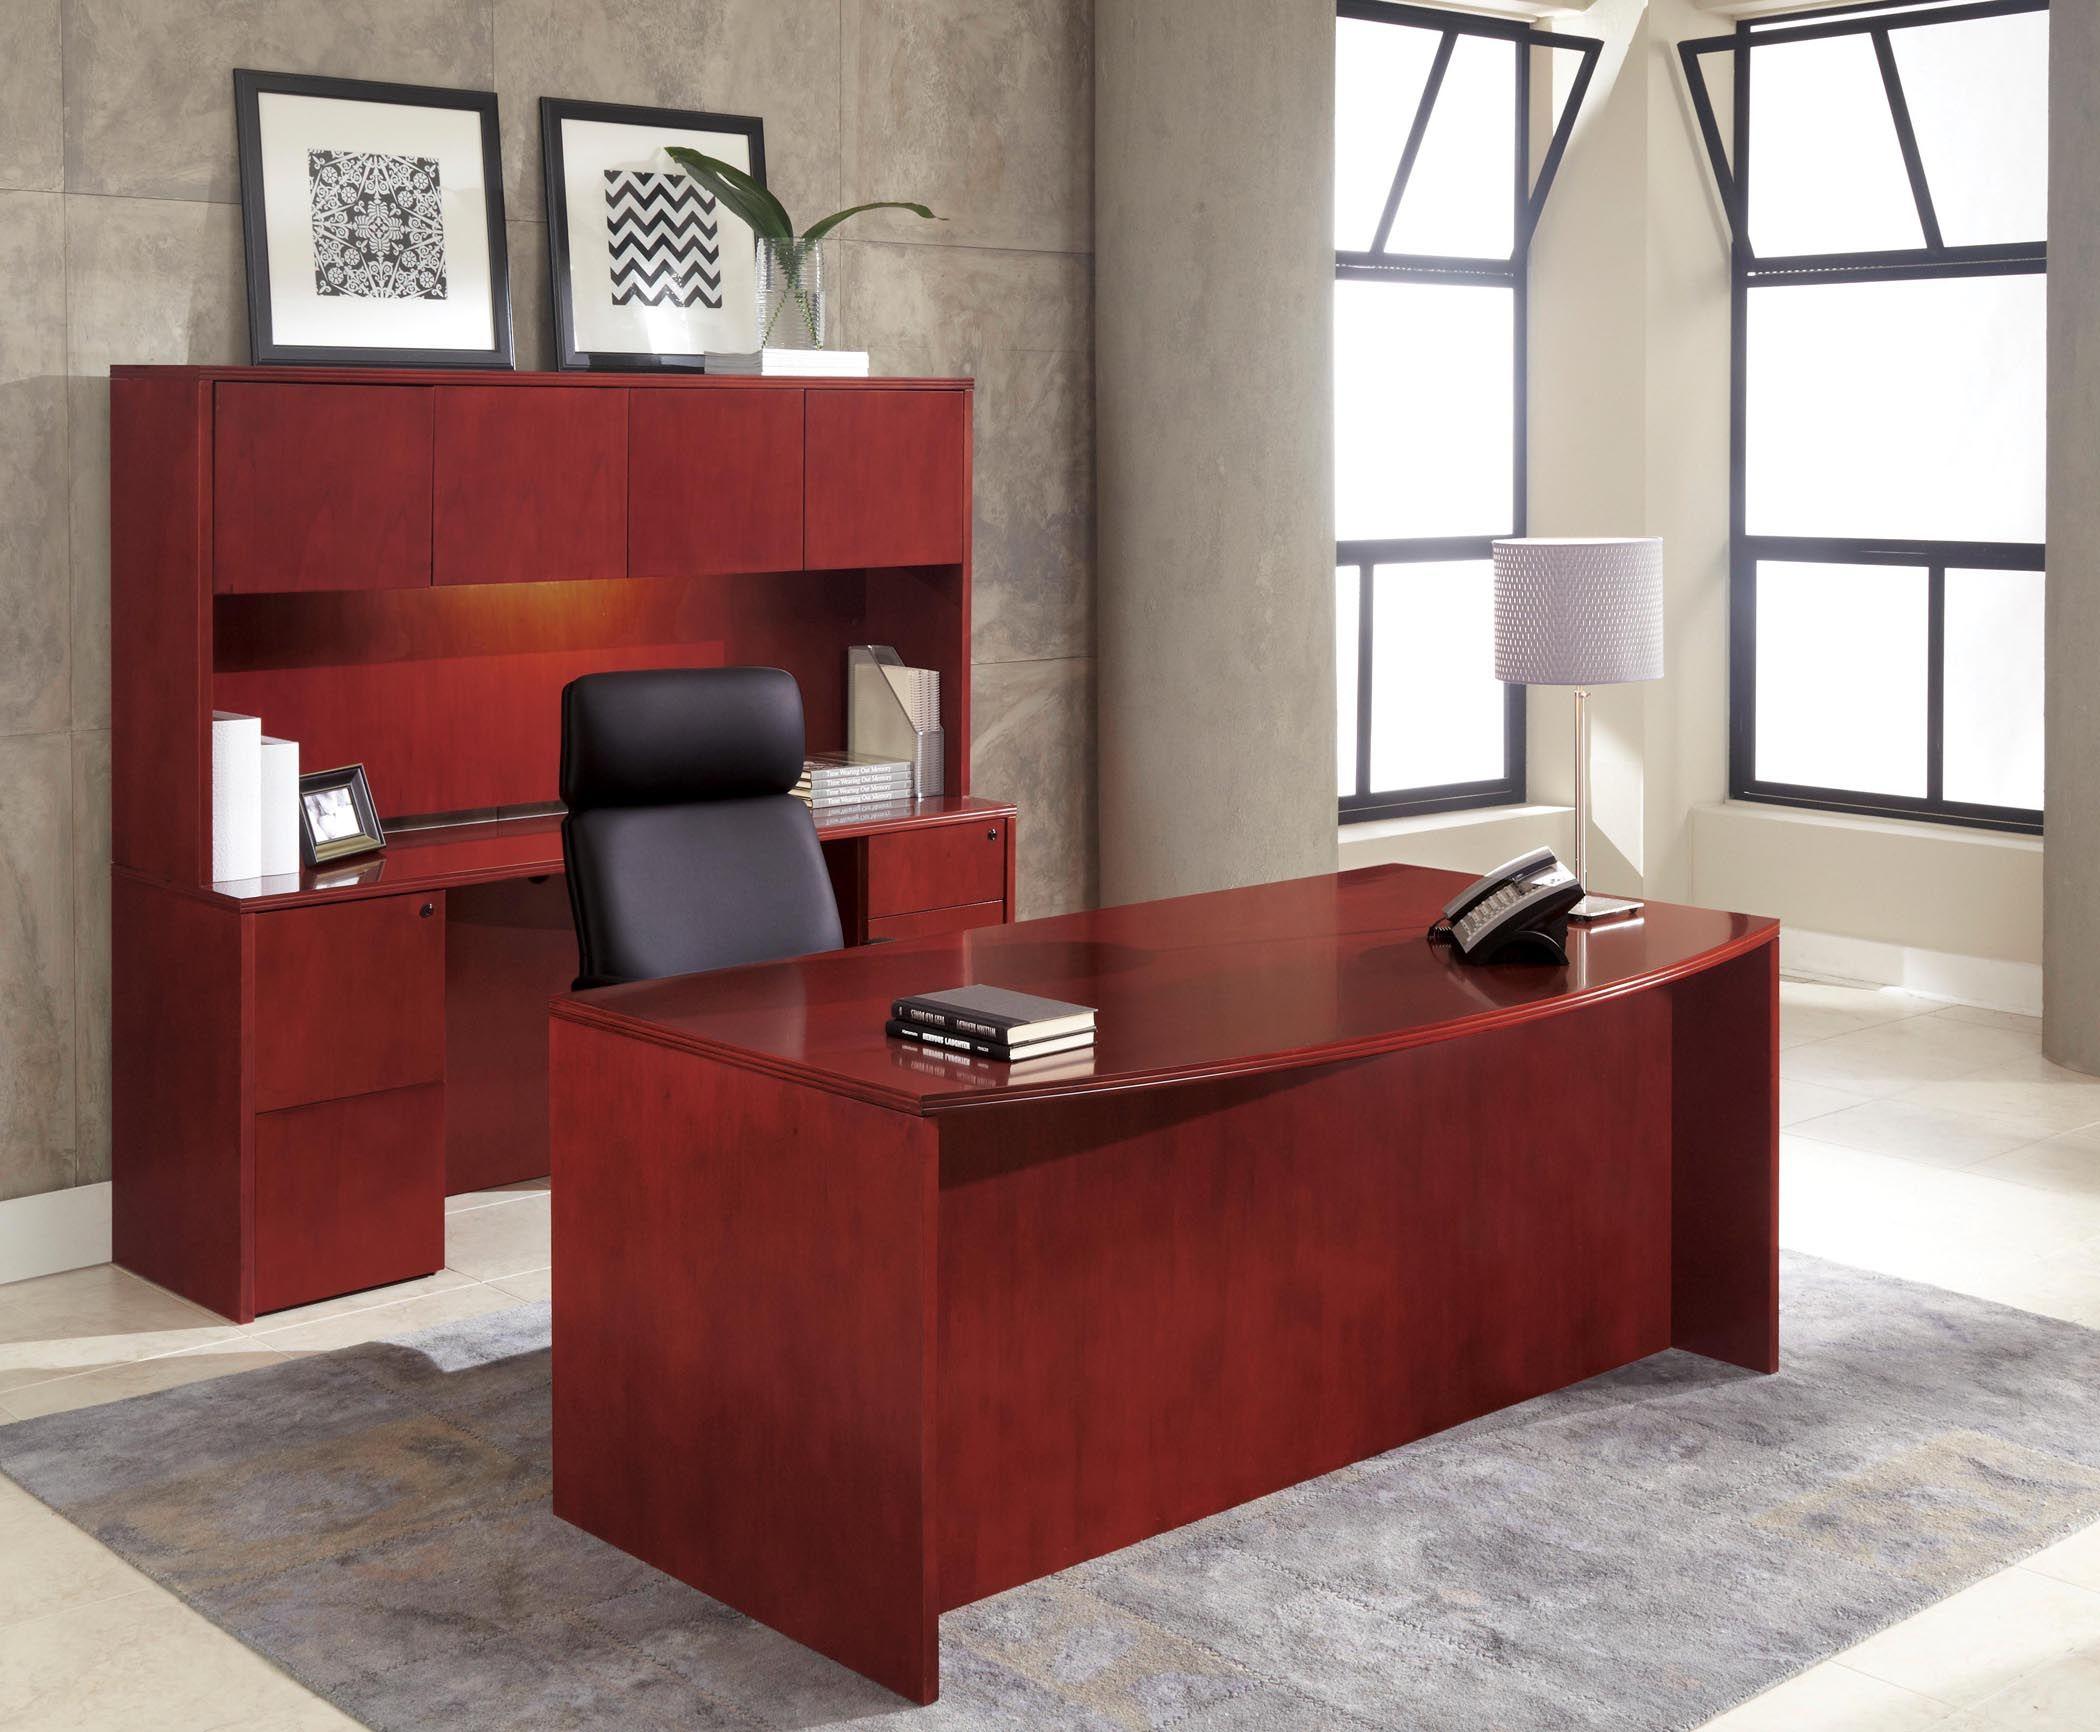 Kirsche office Stuhl | BüroMöbel | Pinterest | Kirsche, Stuhl und ...